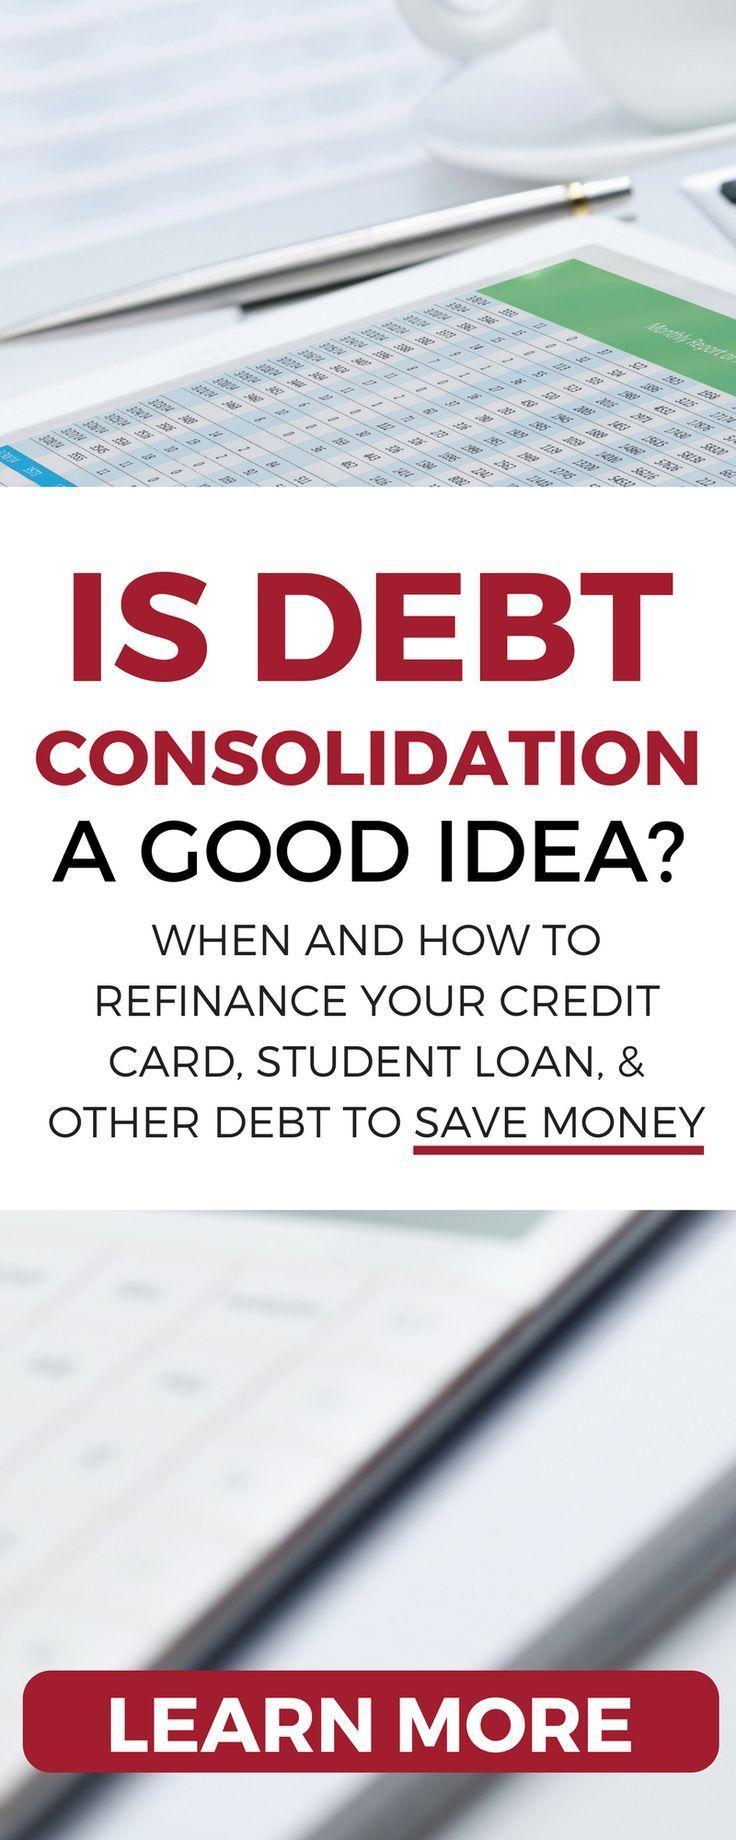 Personal Loans For Debt Consolidation A Good Idea Credit Card Debt Relief Debt Relief Programs Debt Consolidation